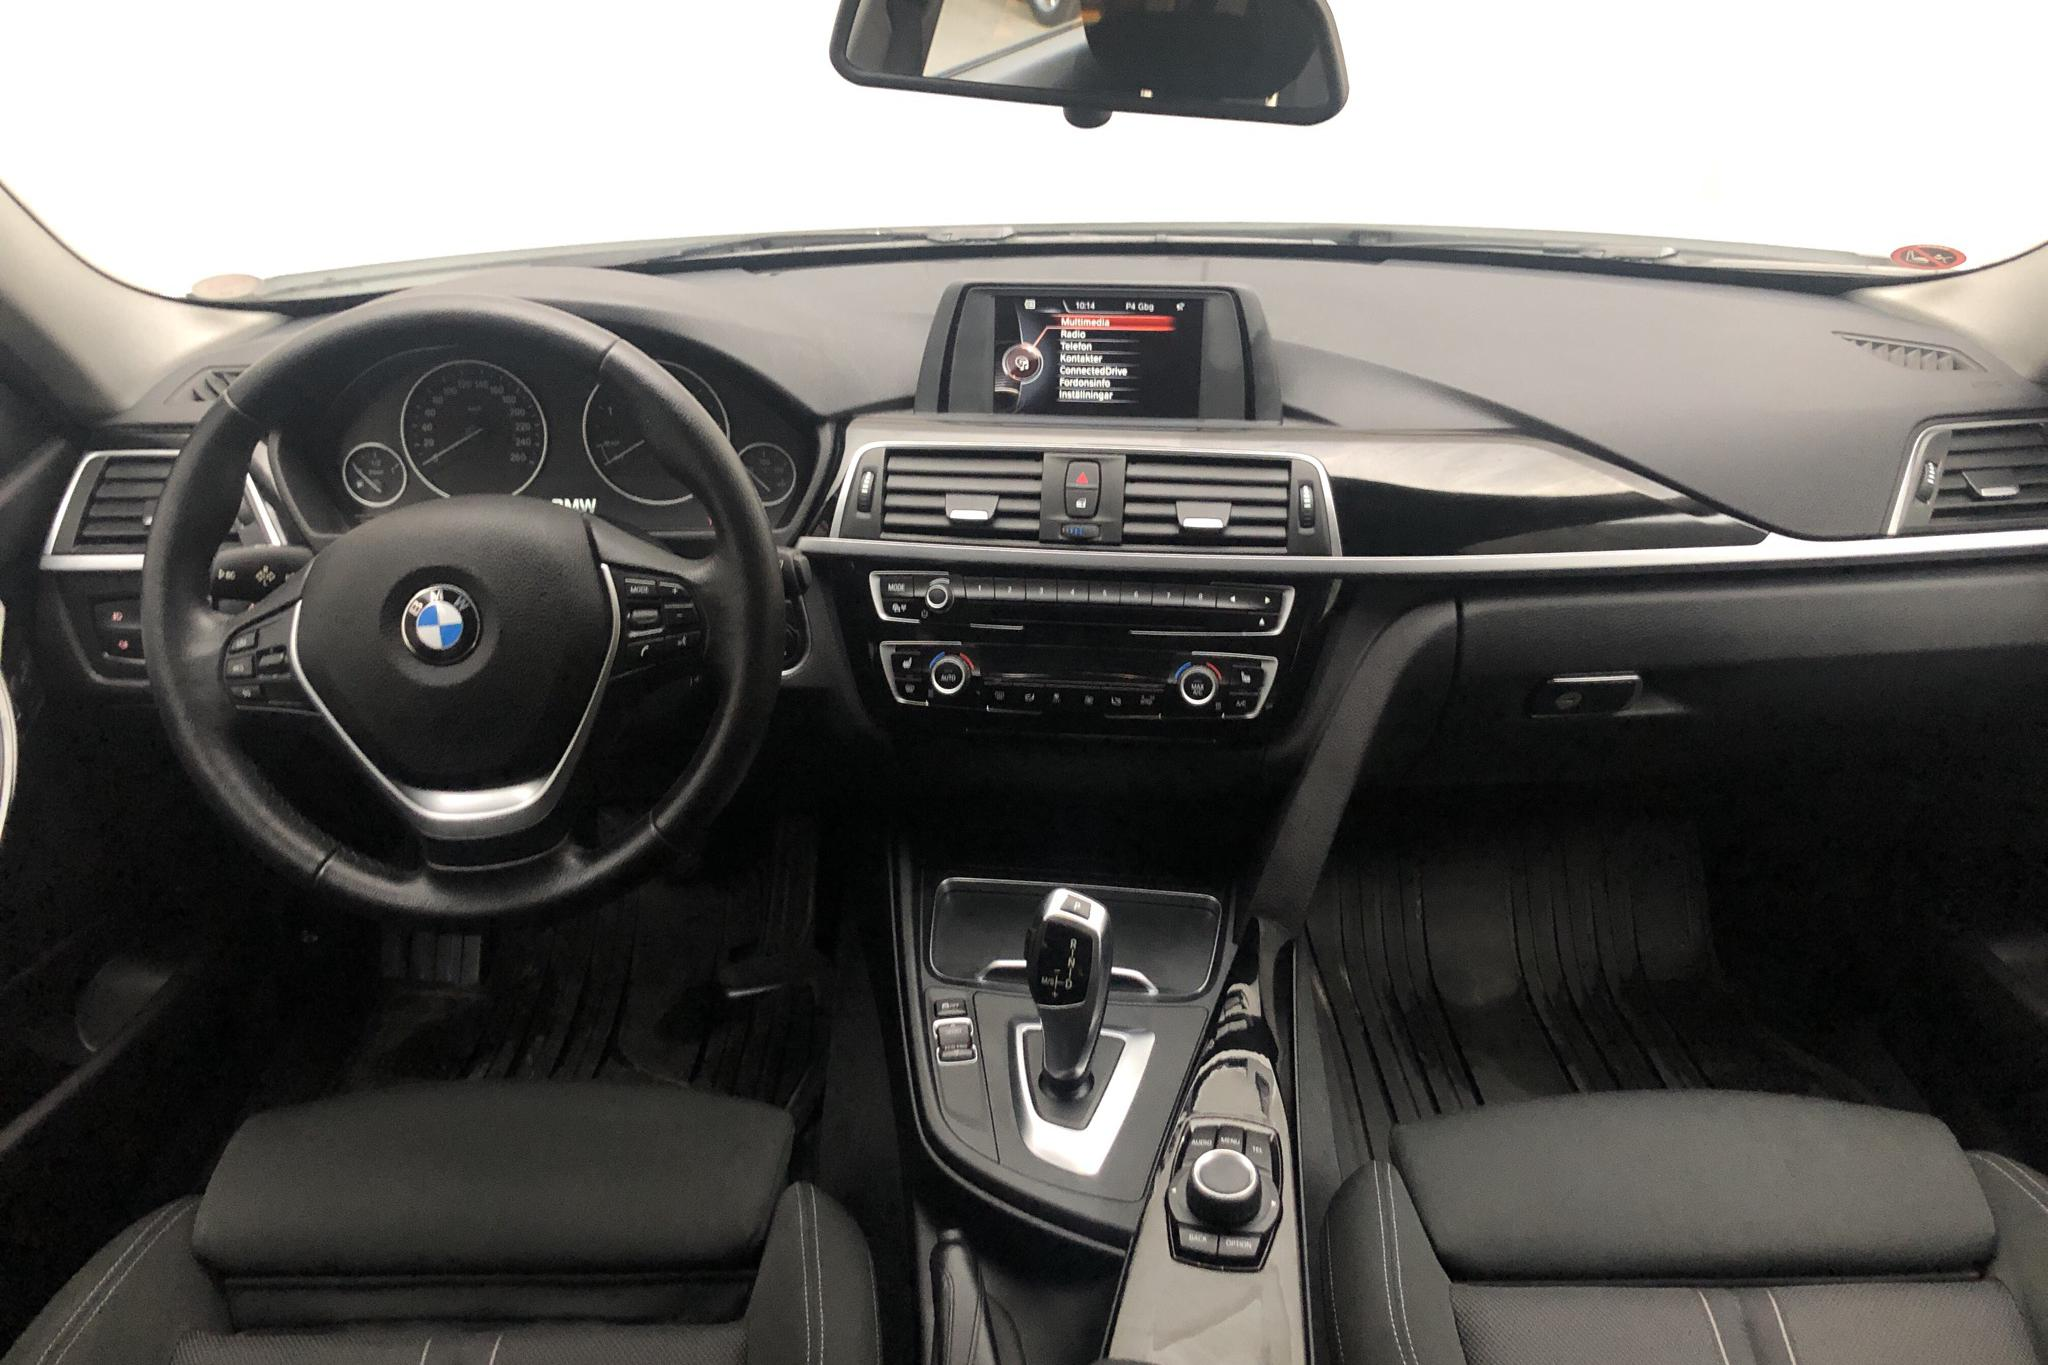 BMW 320d Touring, F31 (190hk) - 91 260 km - Automatic - white - 2016